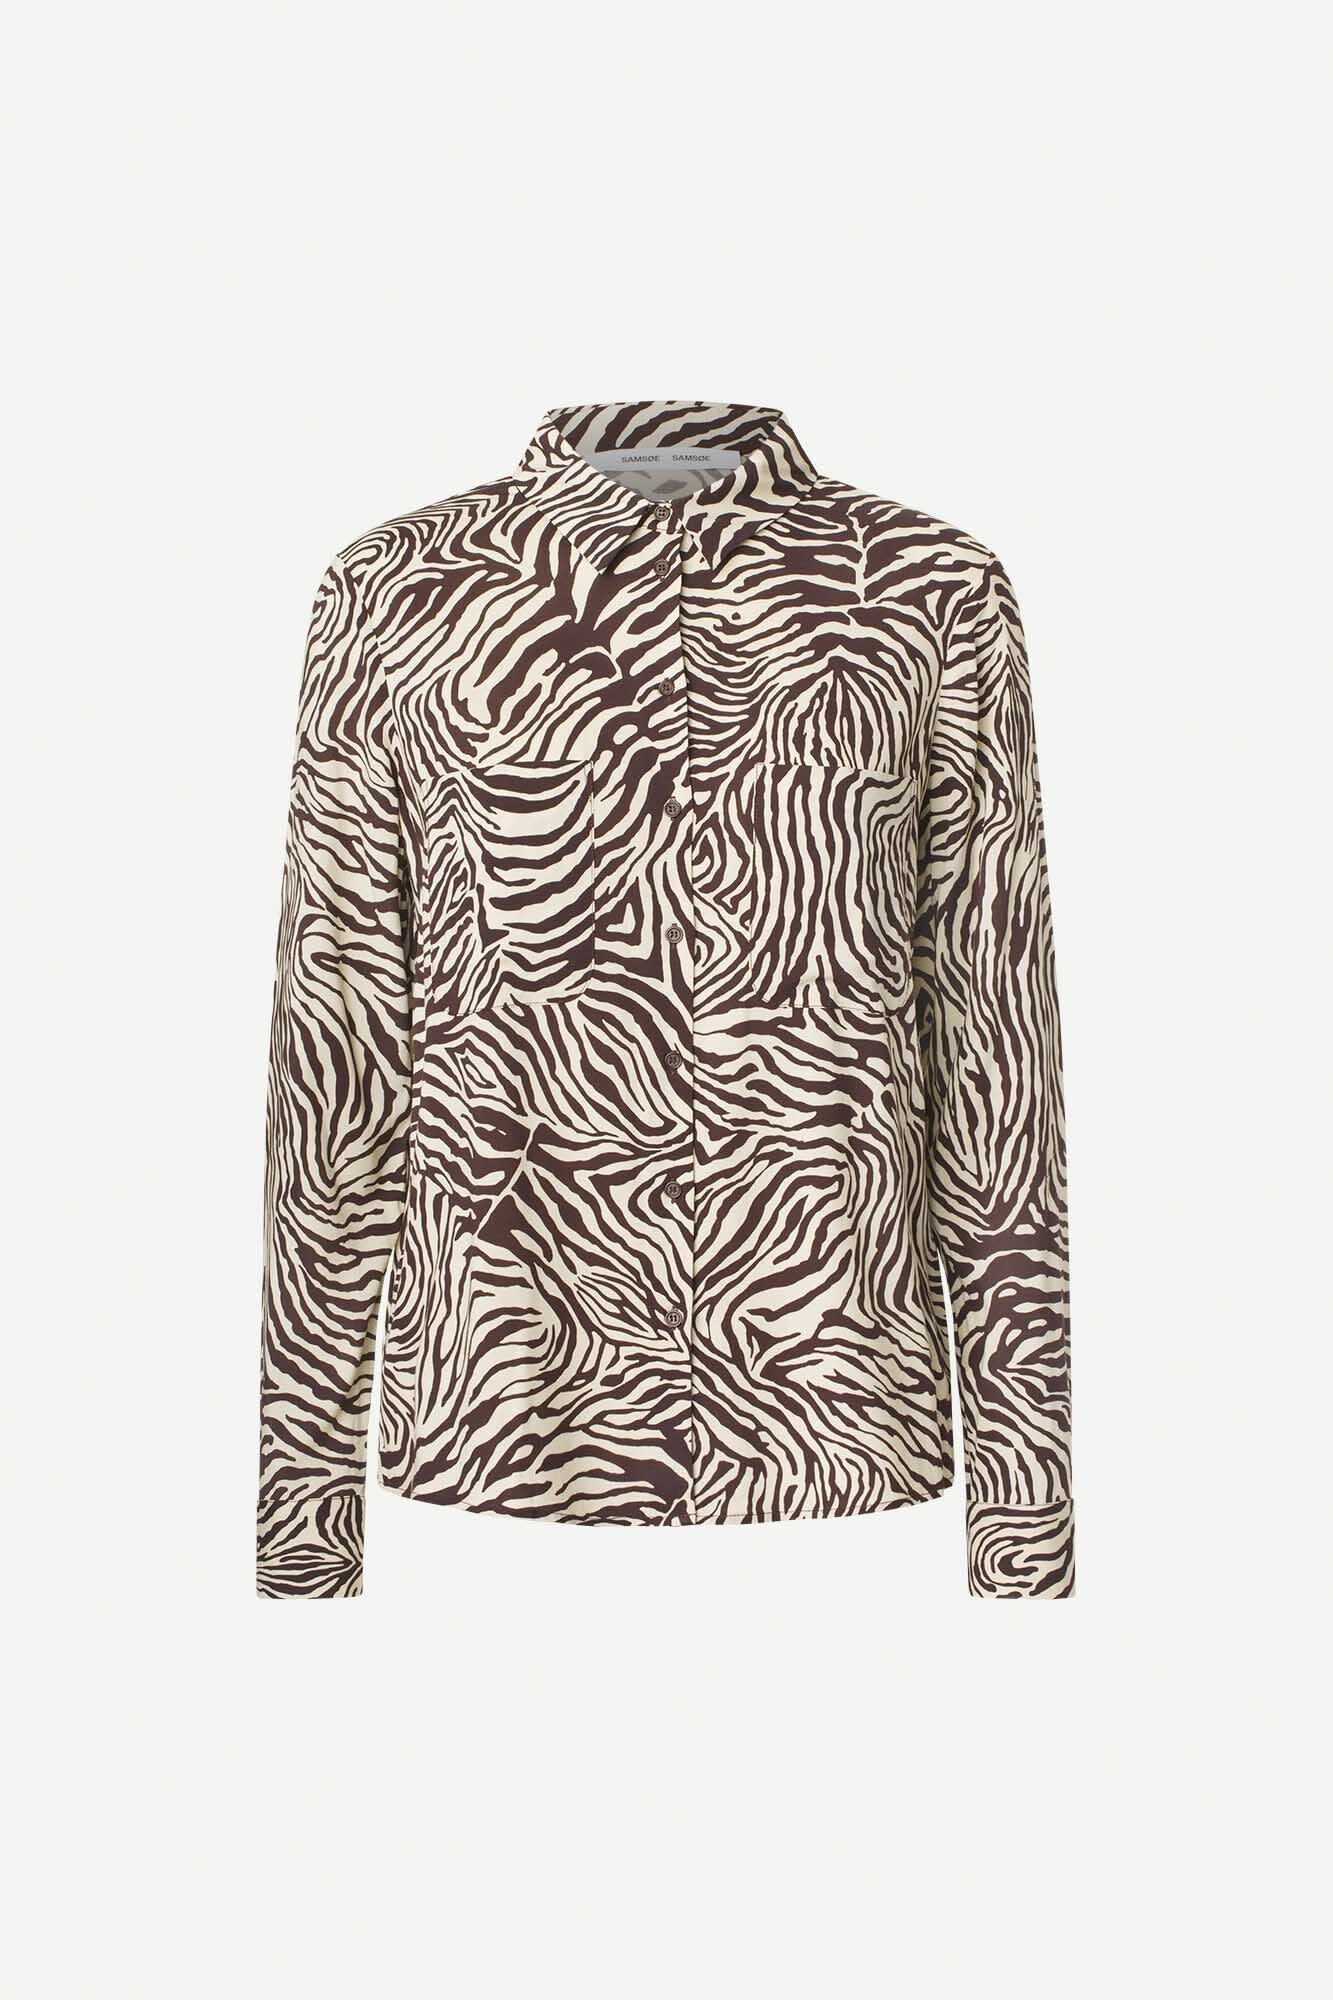 Milly shirt Samsoe,-4